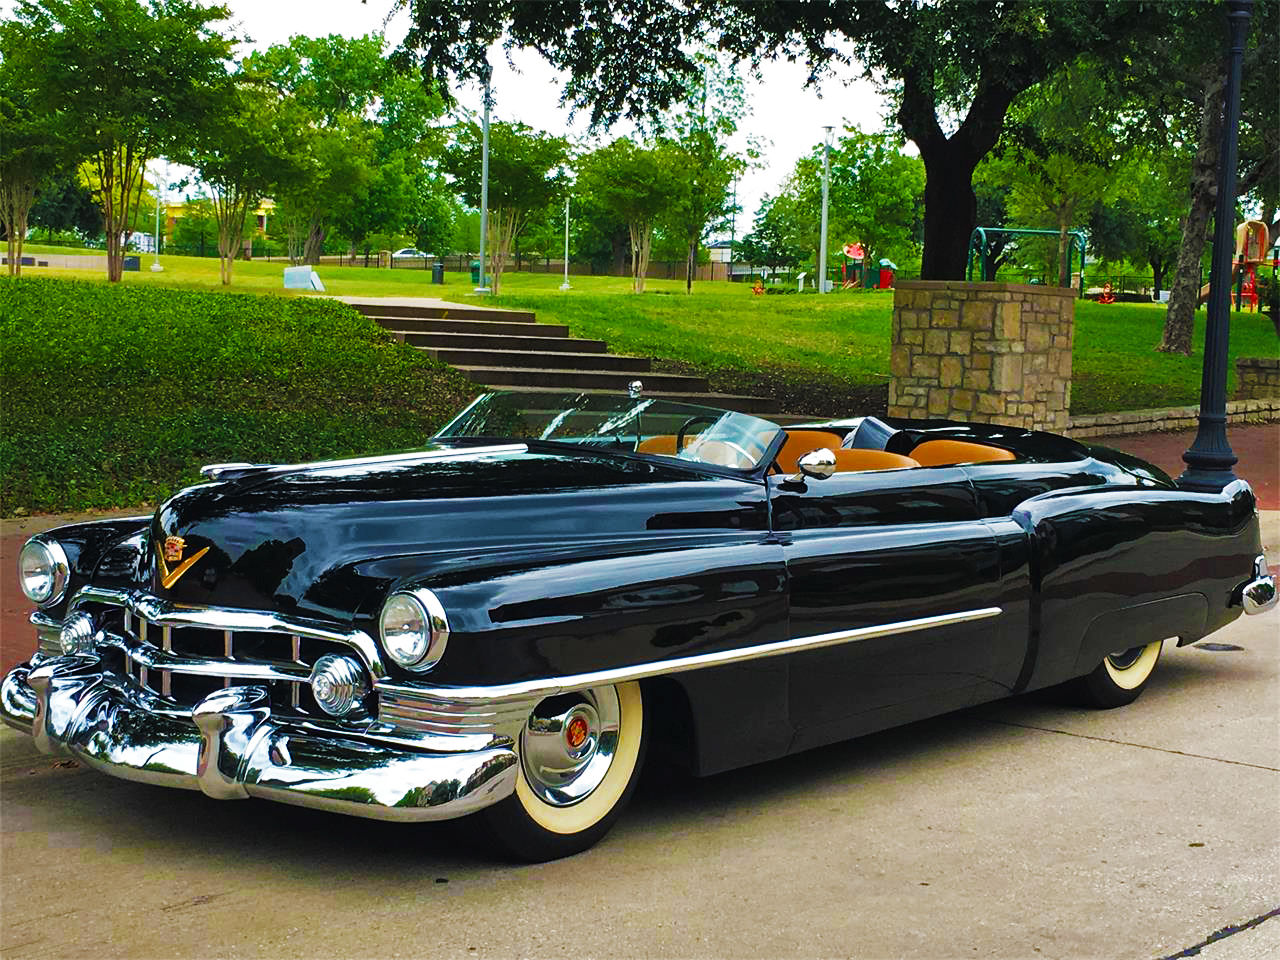 1950 Cadillac Series 62 https://t.co/ptQGjnJ9KW